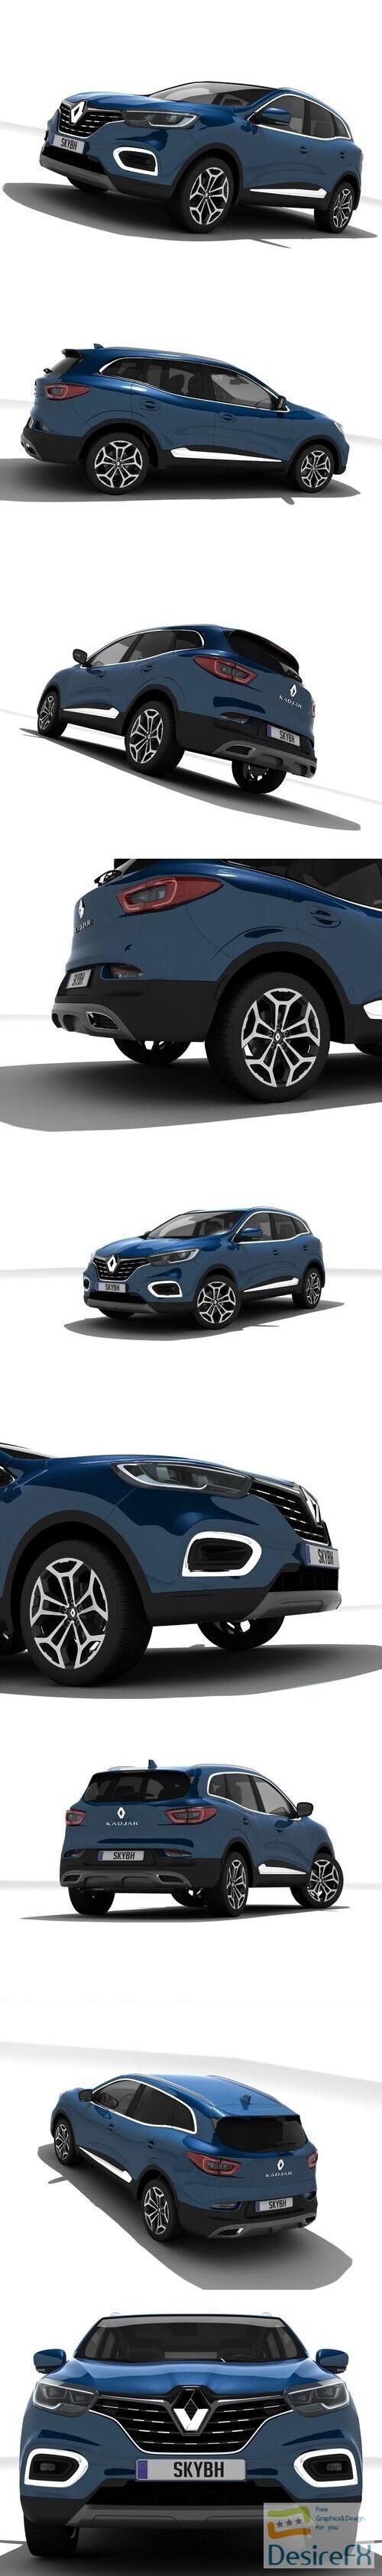 Renault Kadjar 3D Model